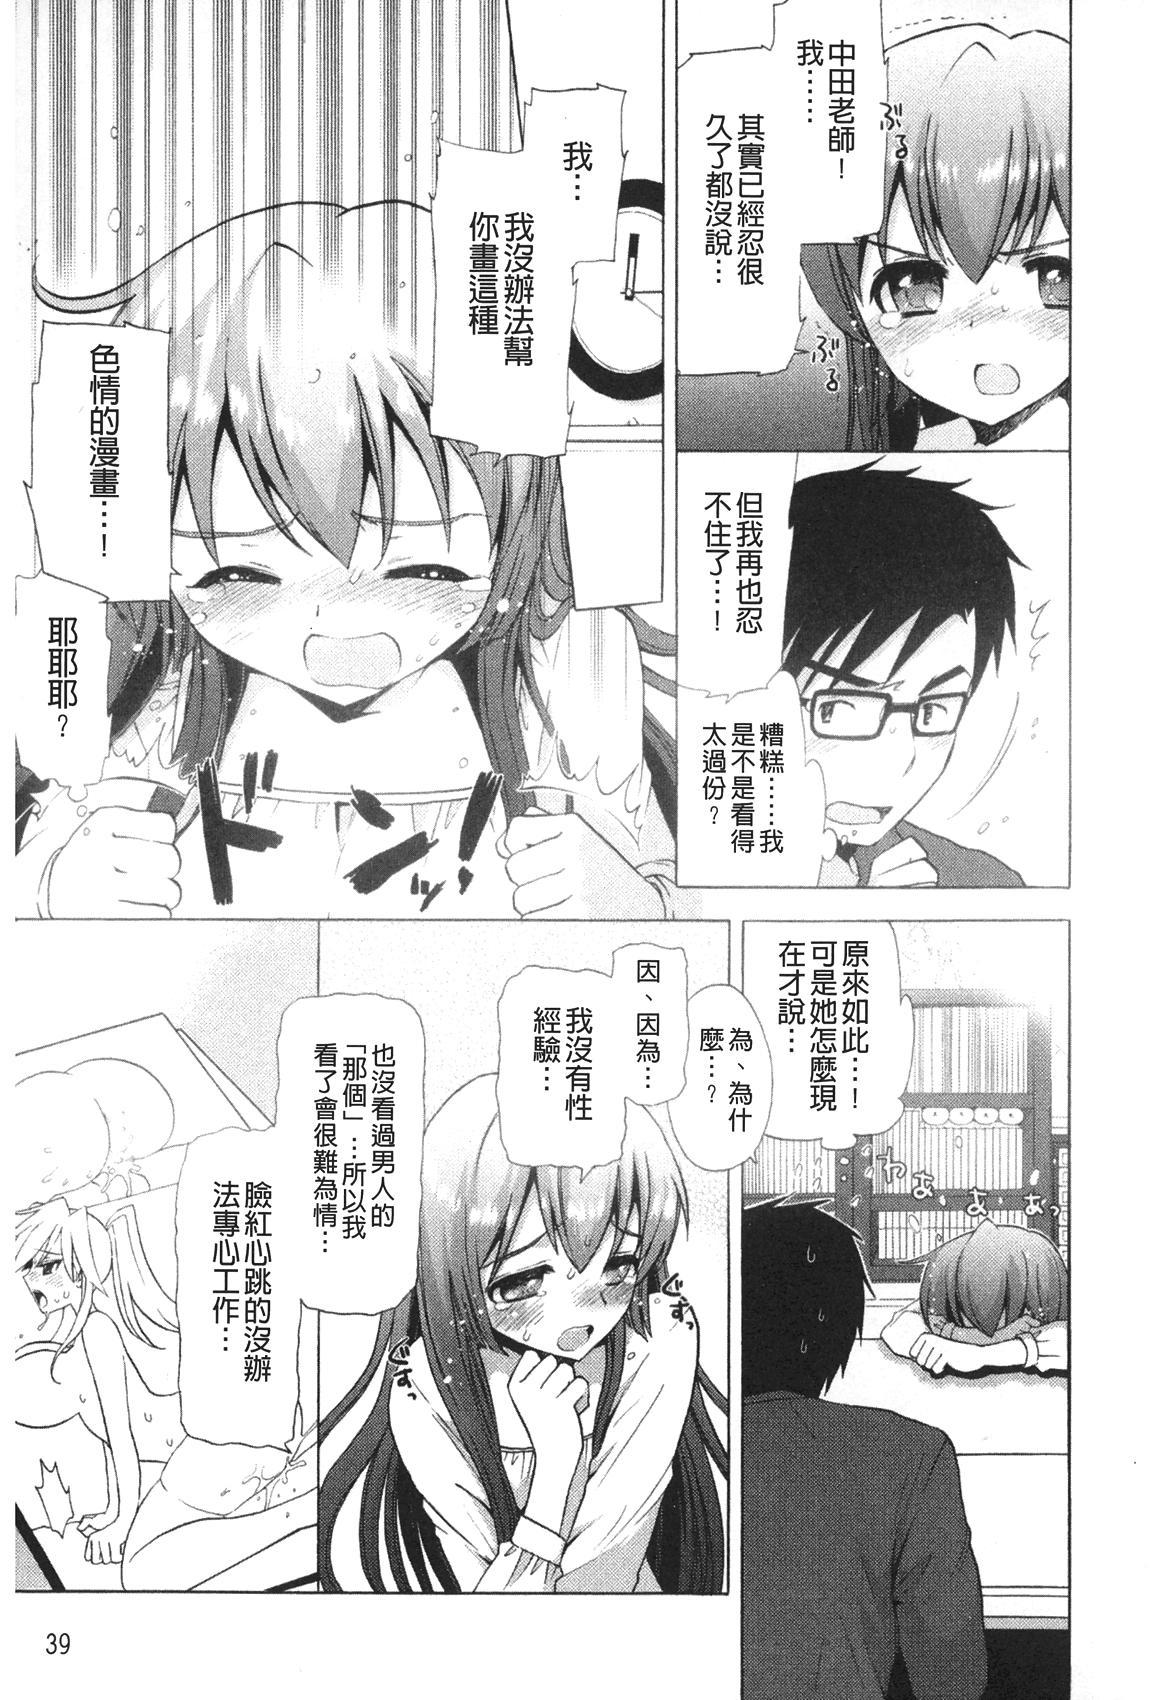 Icha Love! | 稚嫩女之愛! 39